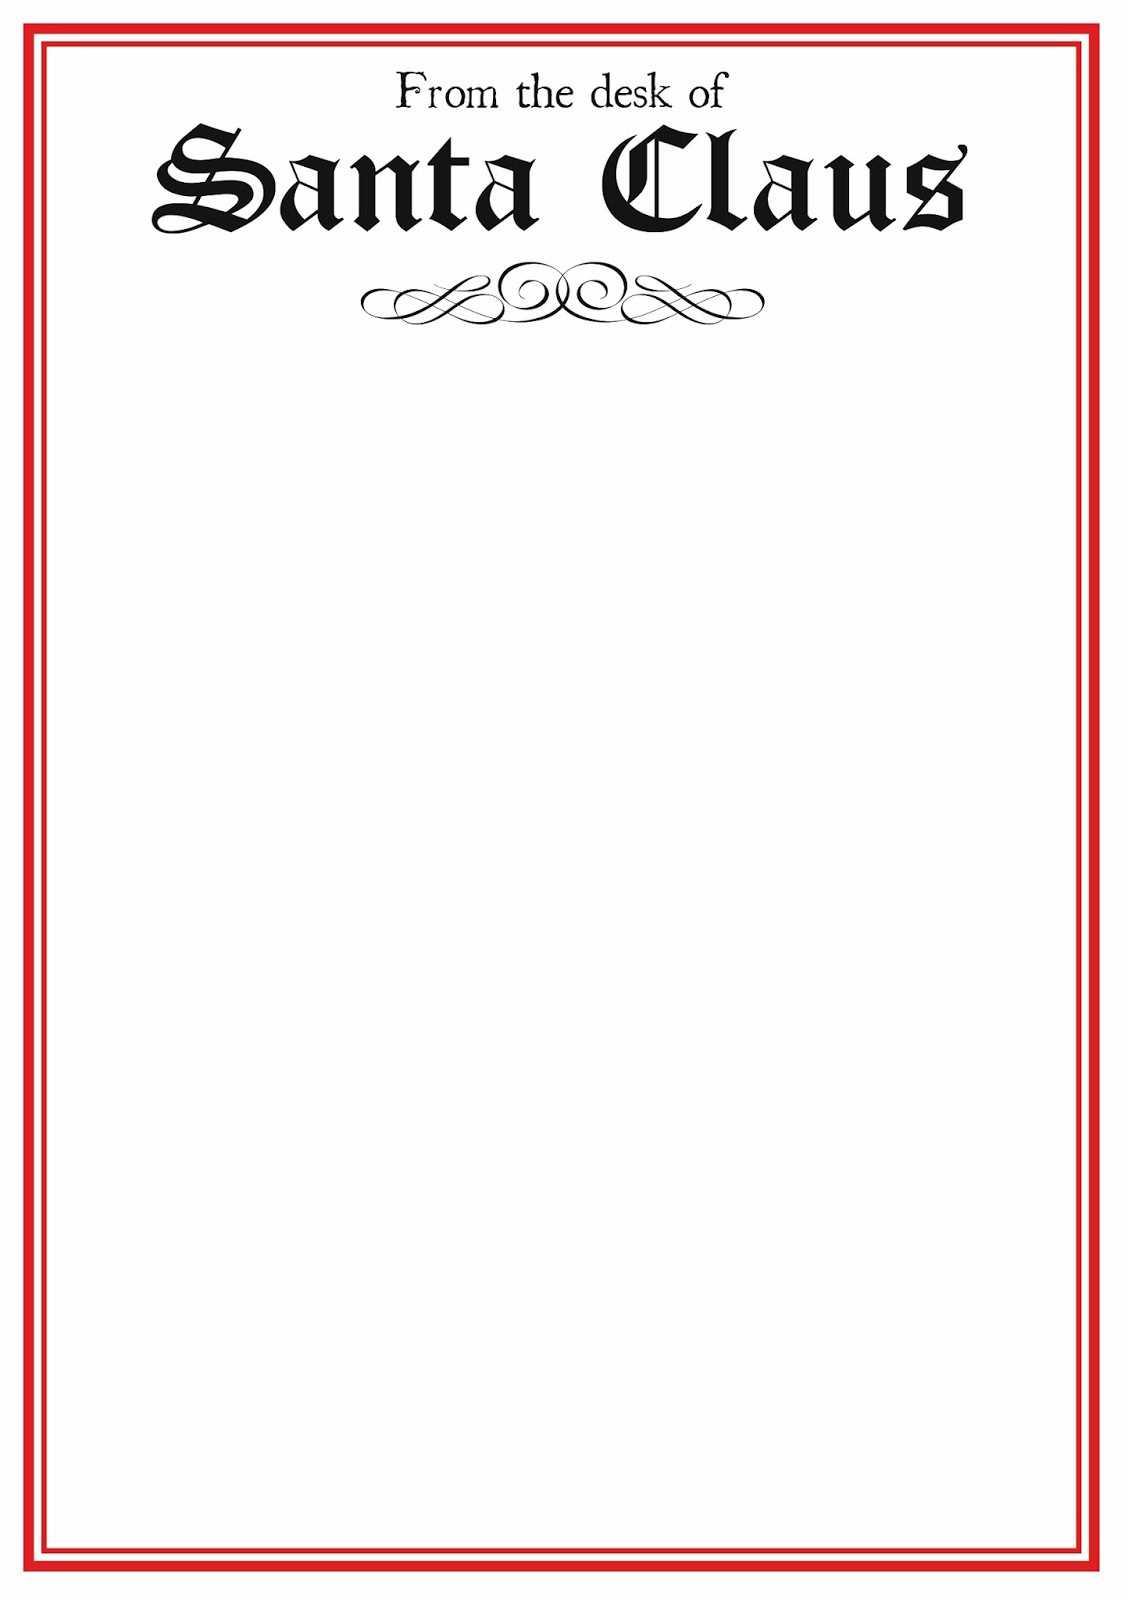 Letter To Santa Template Word – Raptor.redmini.co Inside Santa Letter Template Word